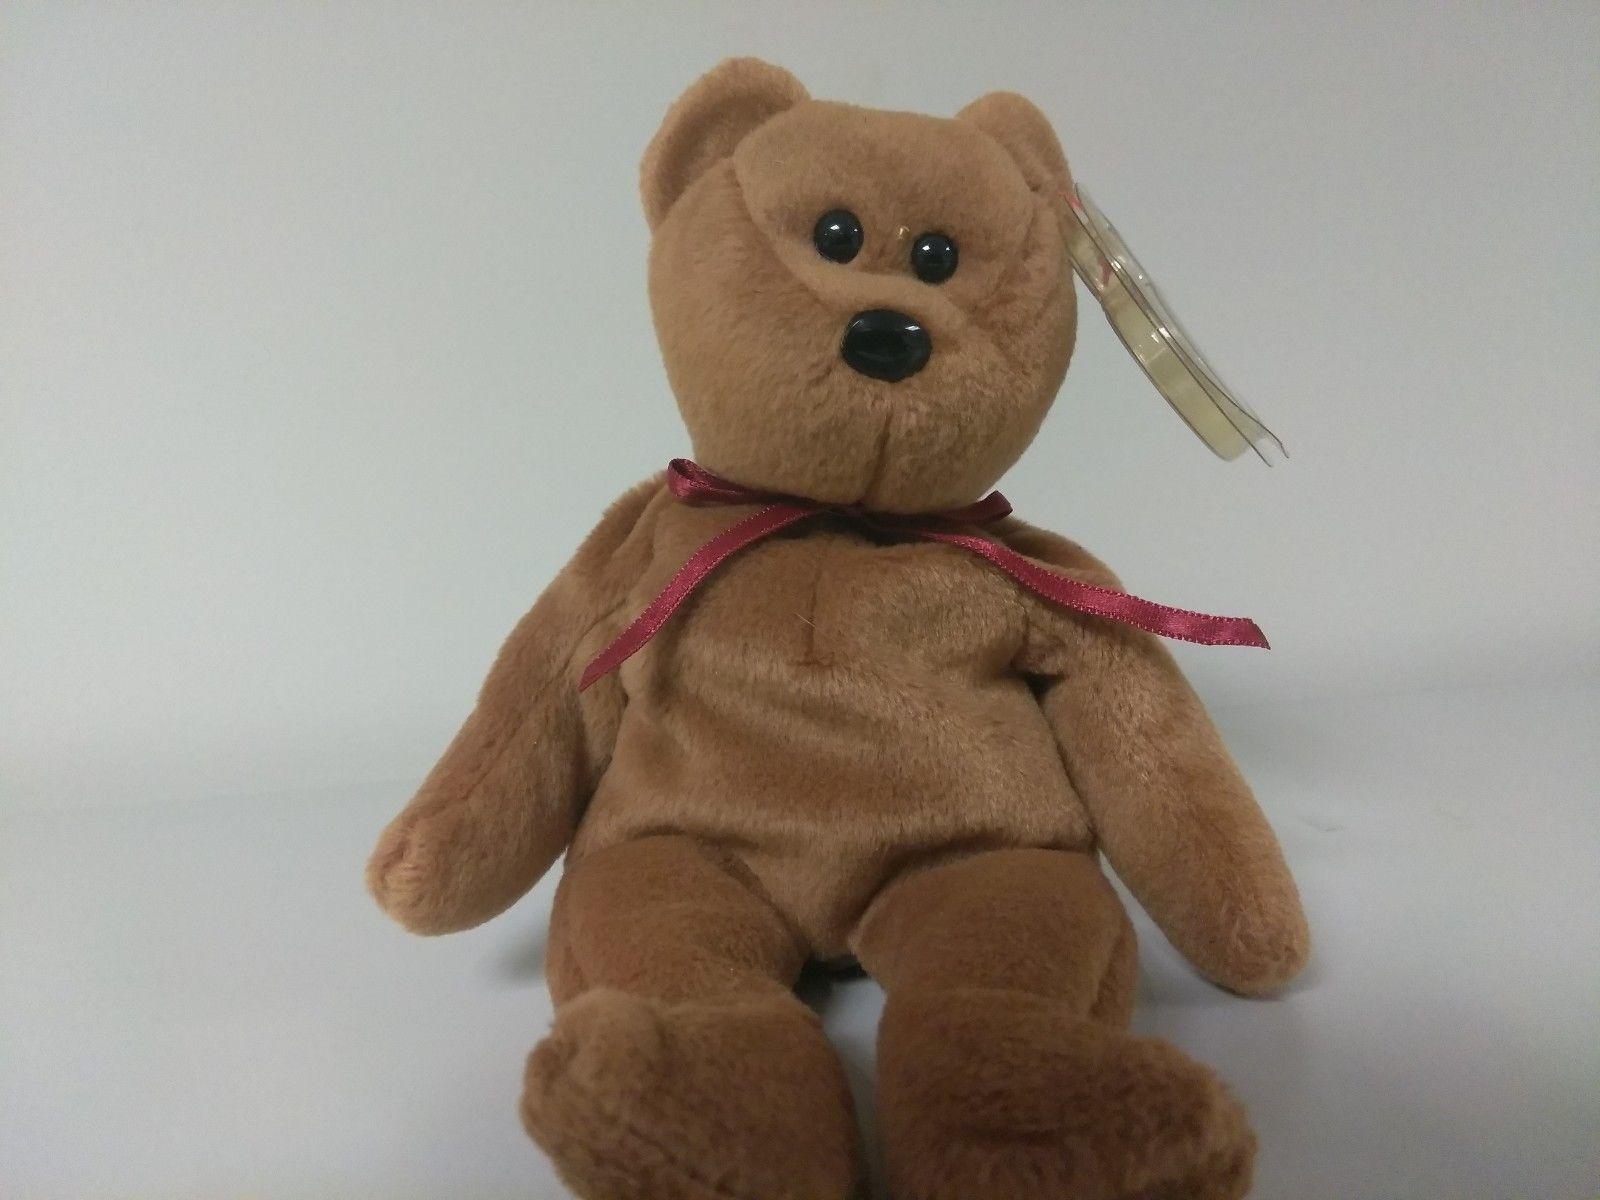 439558f7909 1st Edition TY Beanie Baby Teddy no stamp